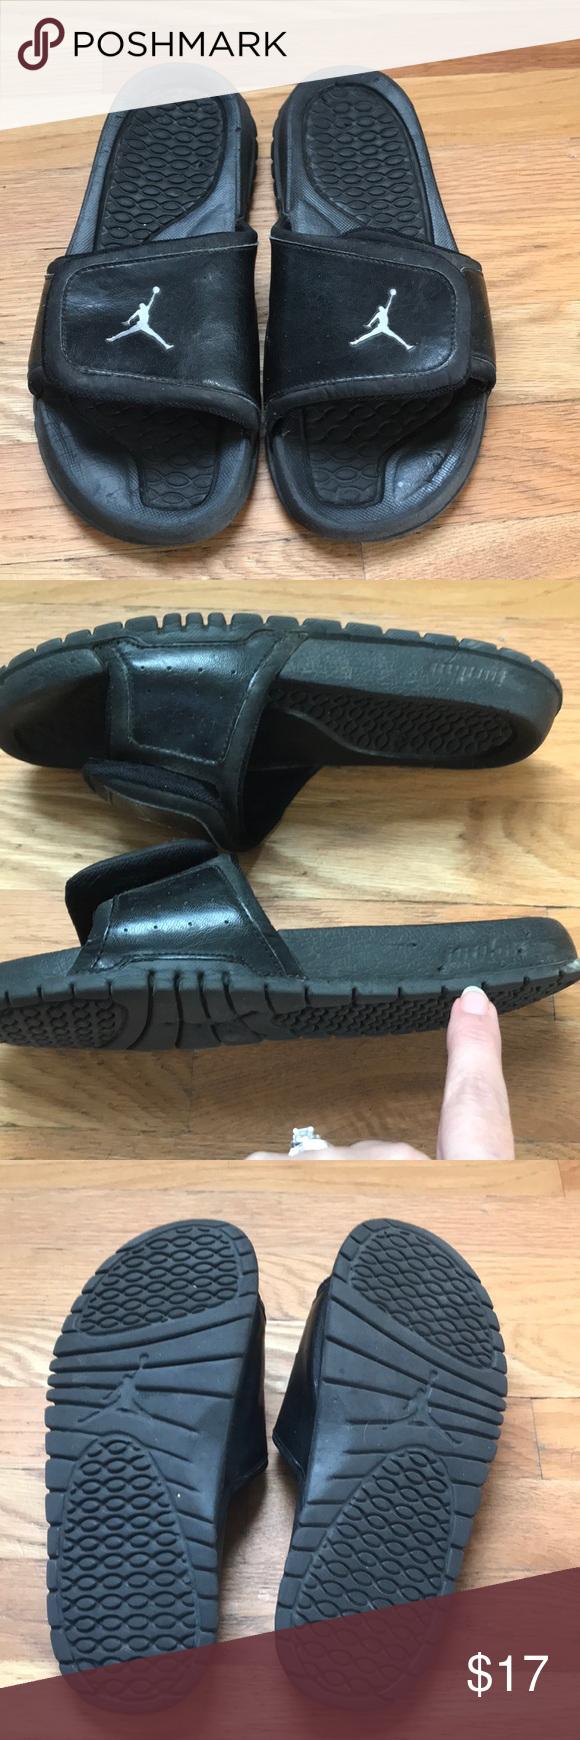 643176ac3442e Men s Jordan Sandals Jordan Slides Good Used Condition- some dings in the  soles (See pic) Make on Offer!! Jordan Shoes Sandals   Flip-Flops